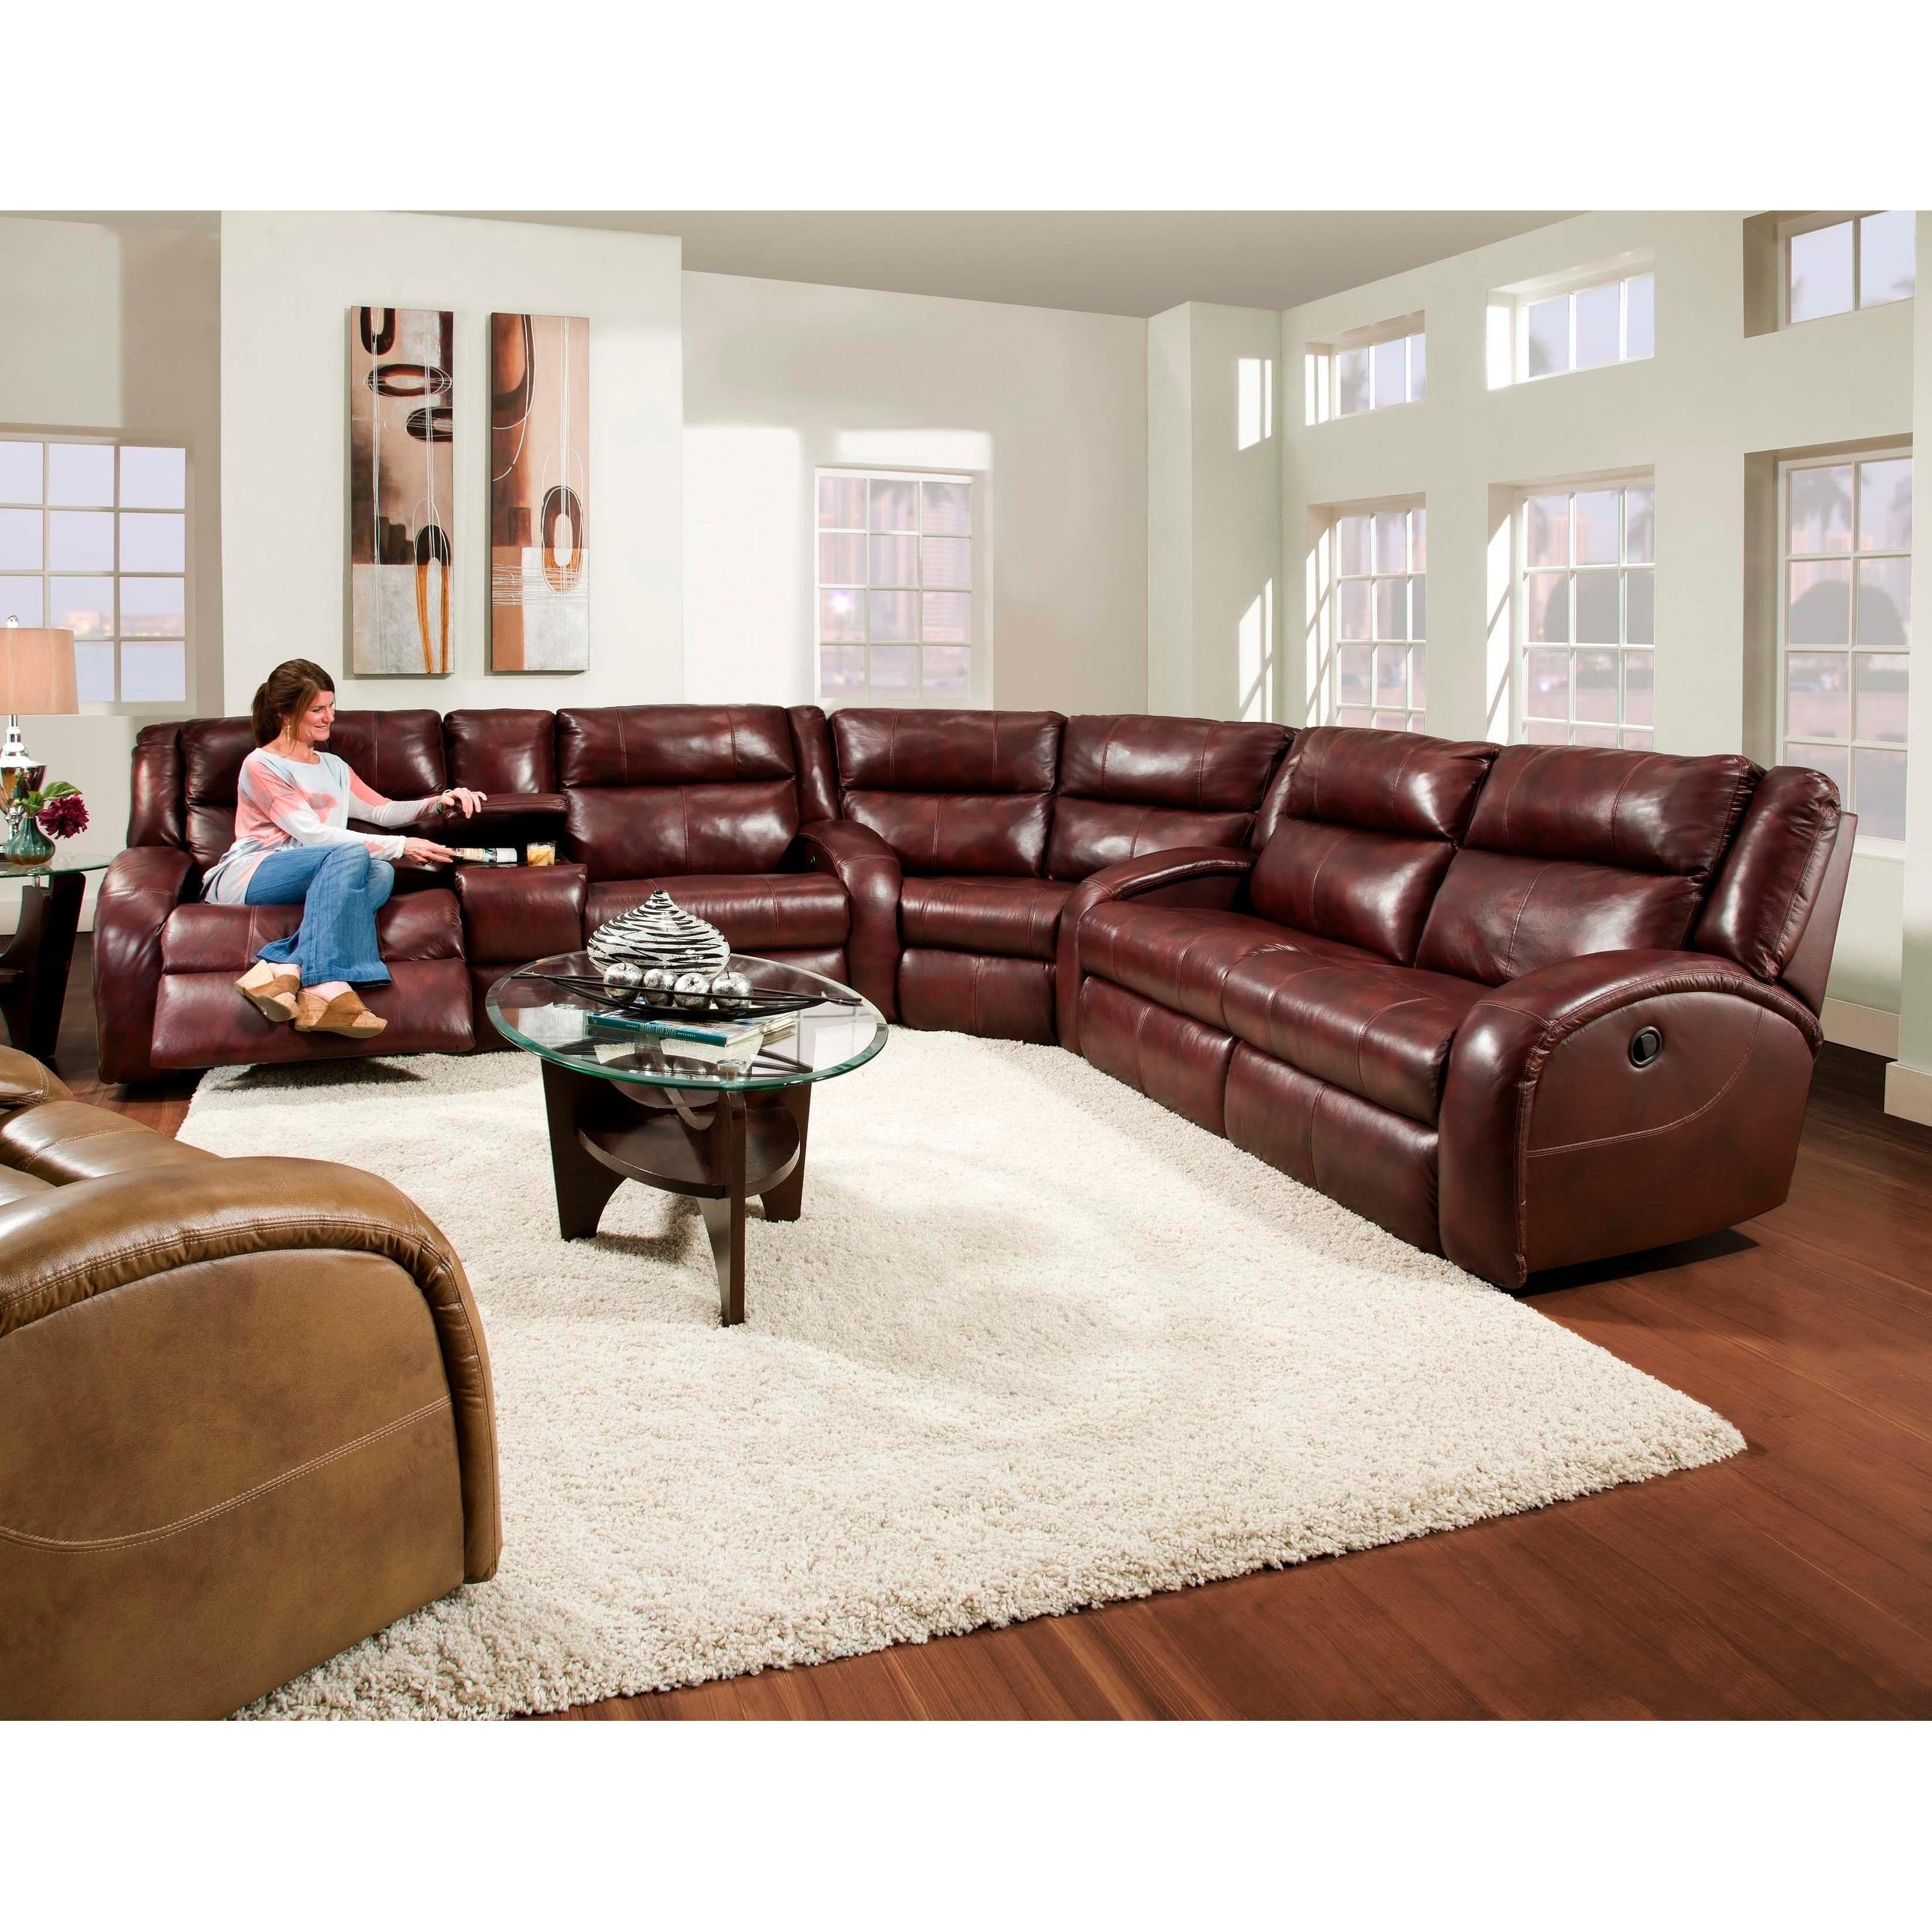 Miraculous Southern Motions Maverick Reclining Sectional Sofa Inzonedesignstudio Interior Chair Design Inzonedesignstudiocom